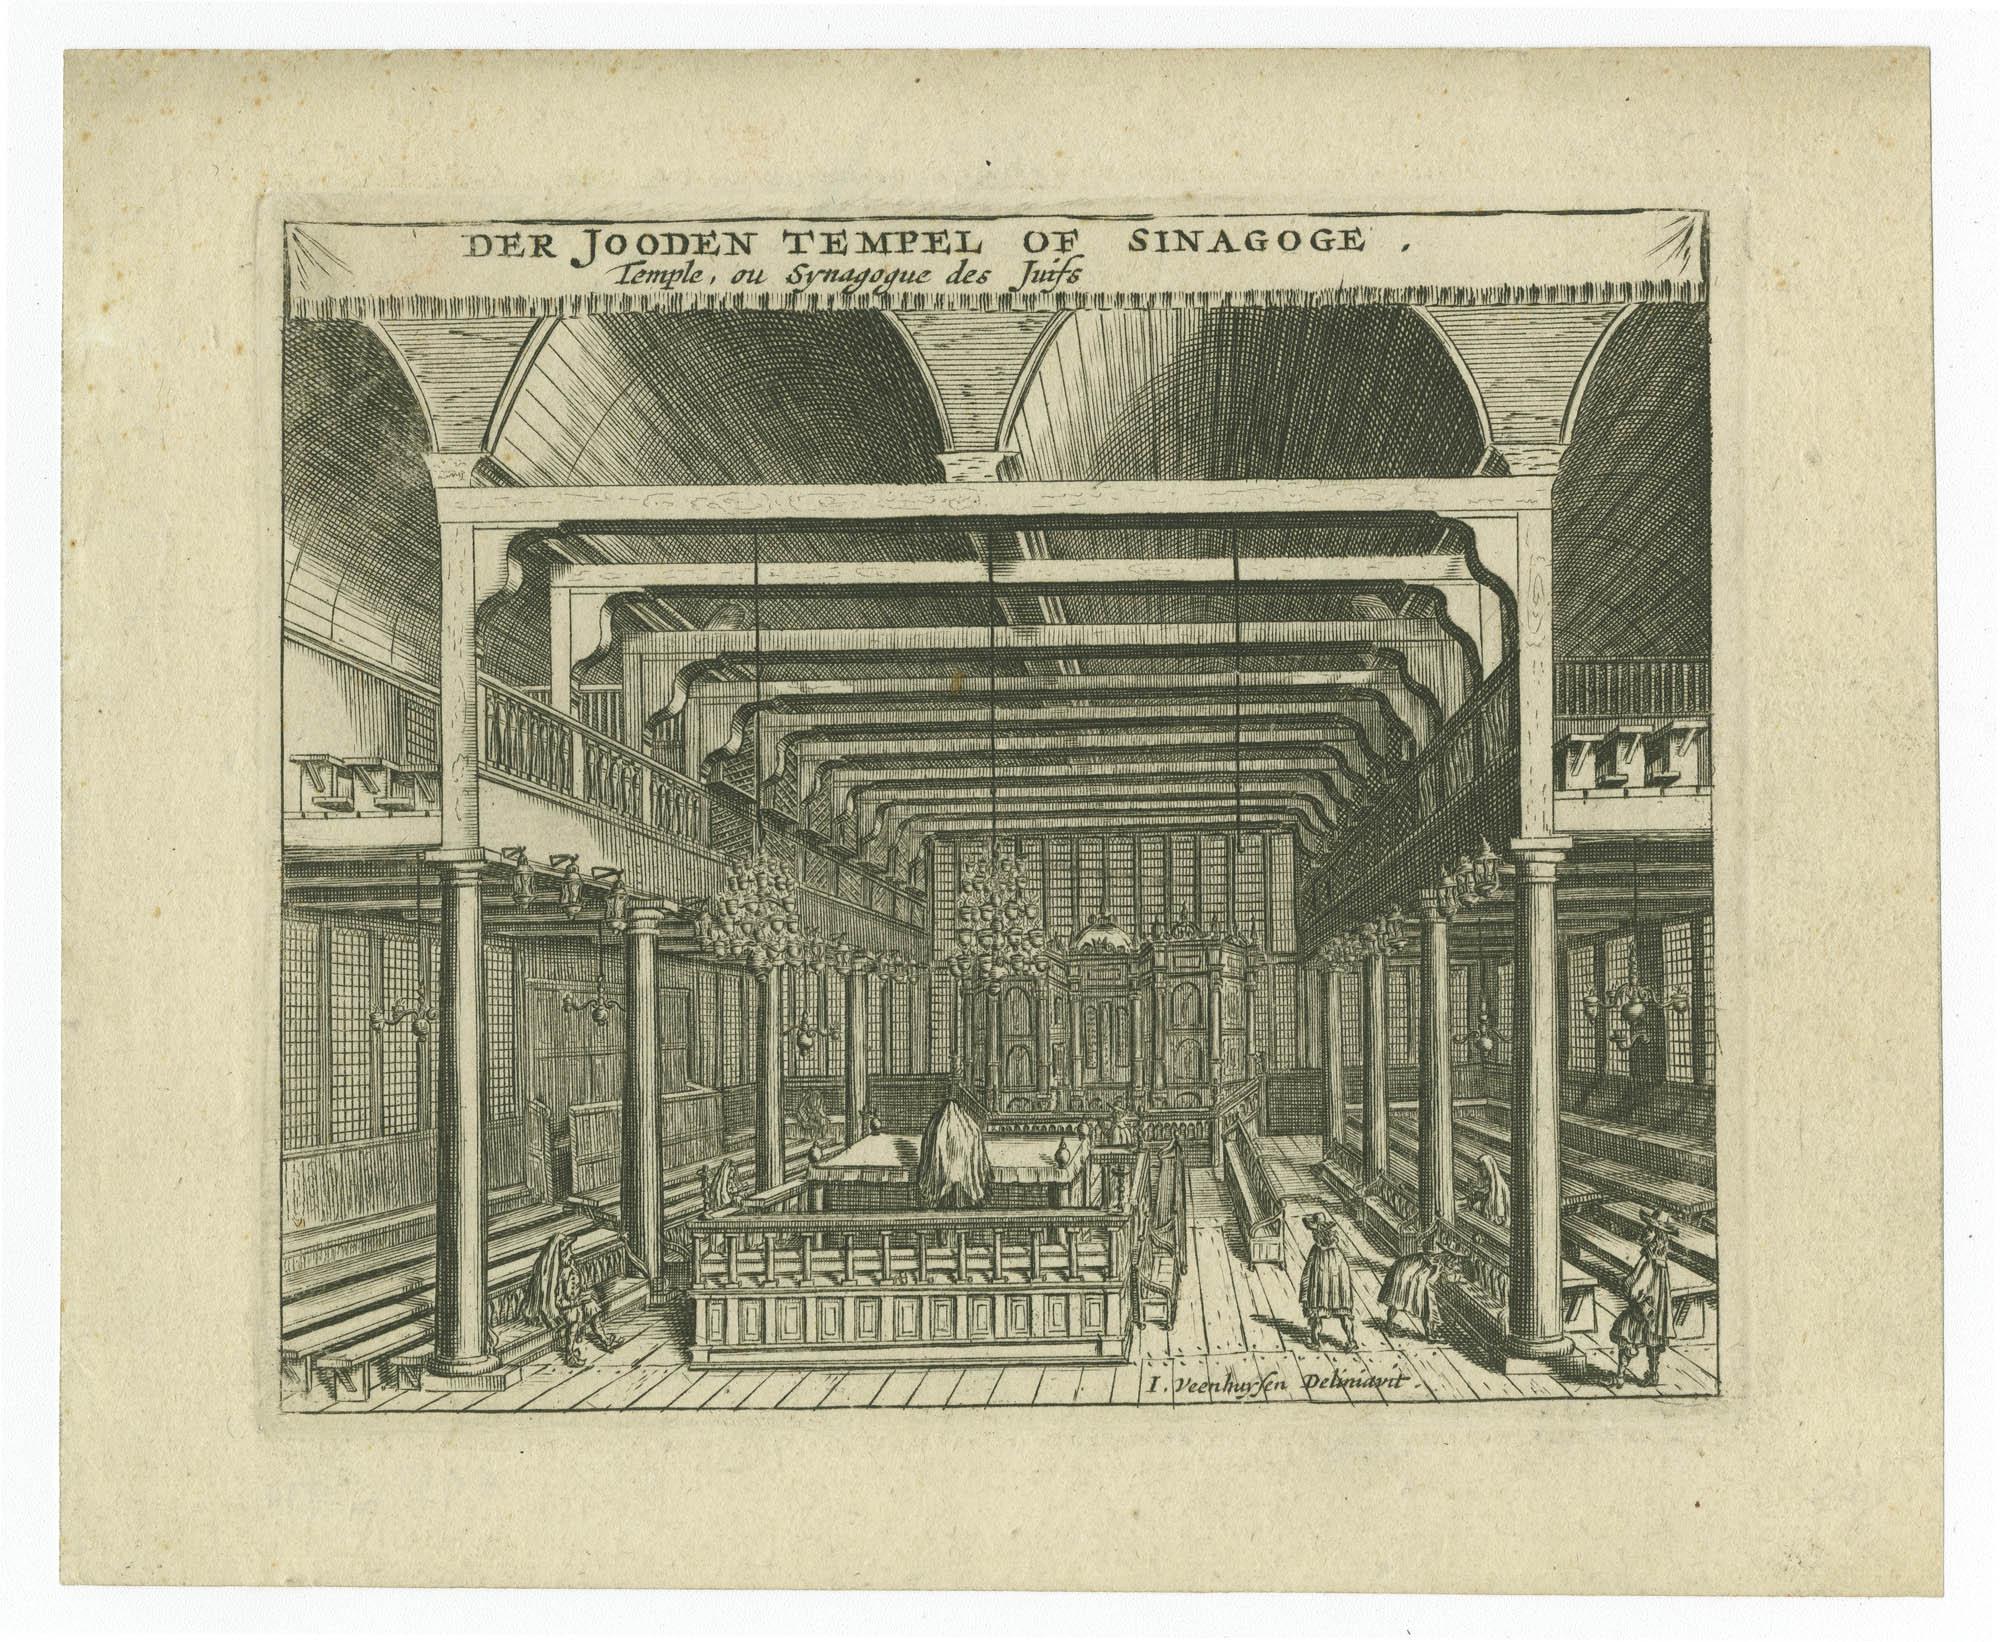 Der Jooden Tempel of Sinagoge / Temple, ou Synagogue des Juifs